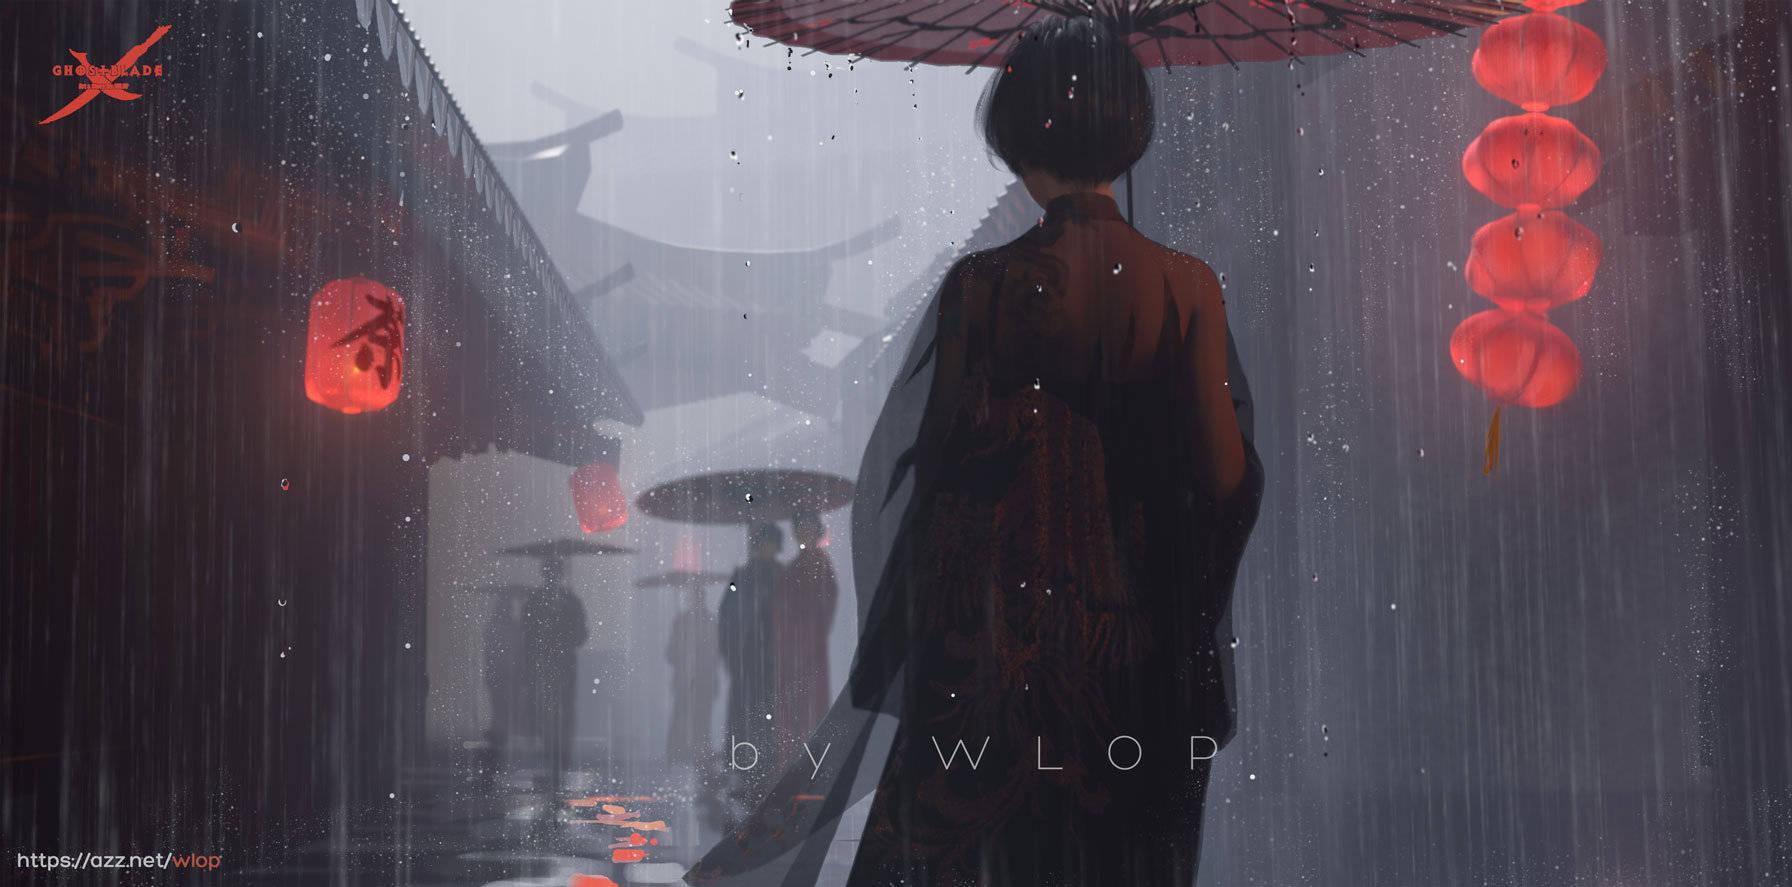 General 1792x887 WLOP Ghost + Blade anime girls umbrella lantern Japanese umbrella rain Asian architecture Ghostblade